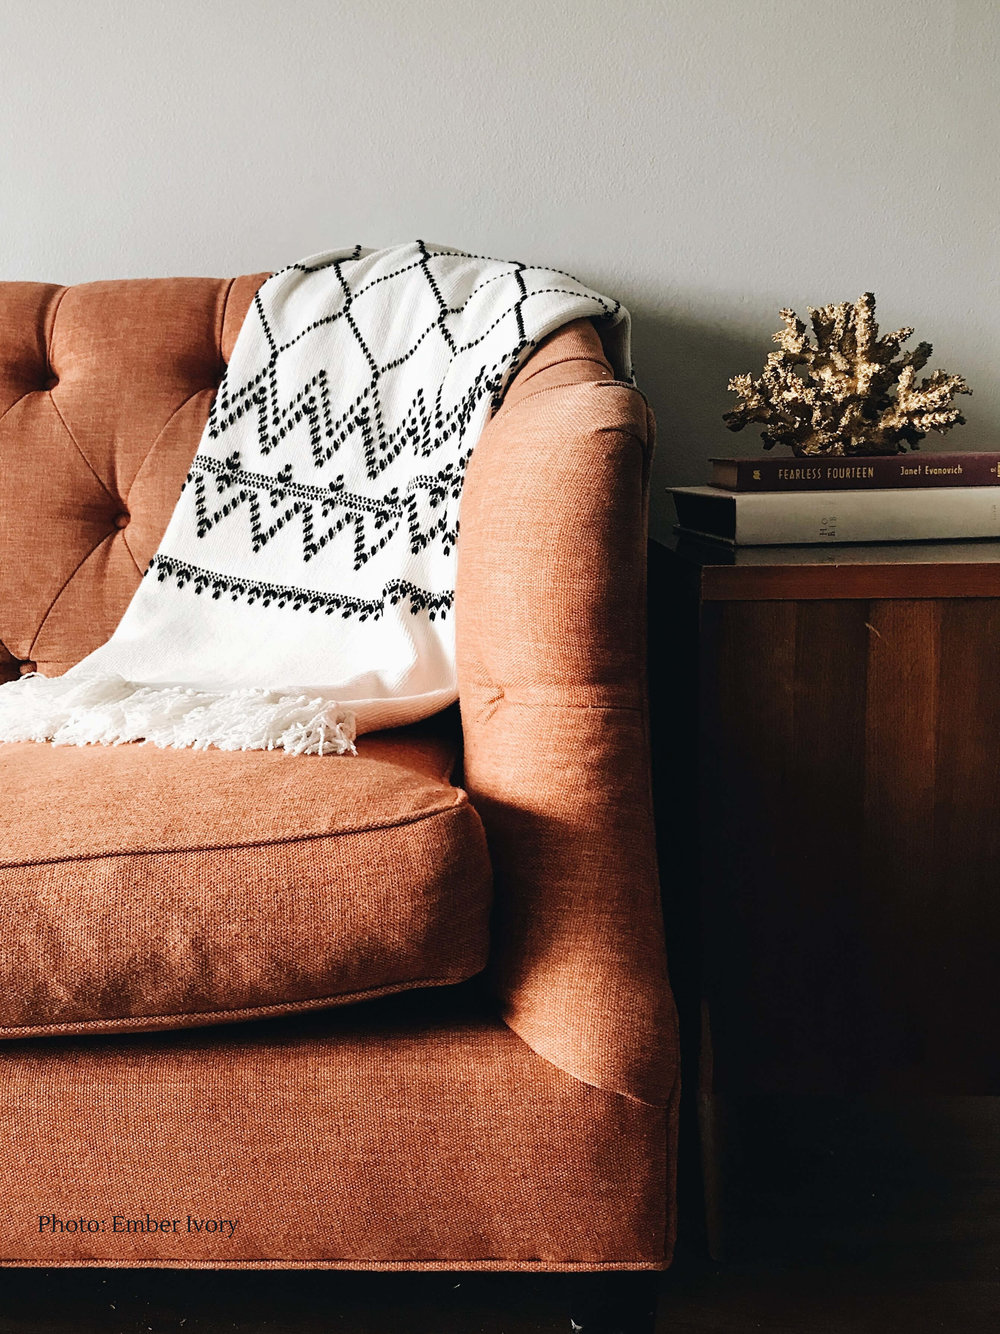 kid-friendly-living-room-ideas-blog-online-kids-interiors ember-ivory-456765-unsplash.jpg